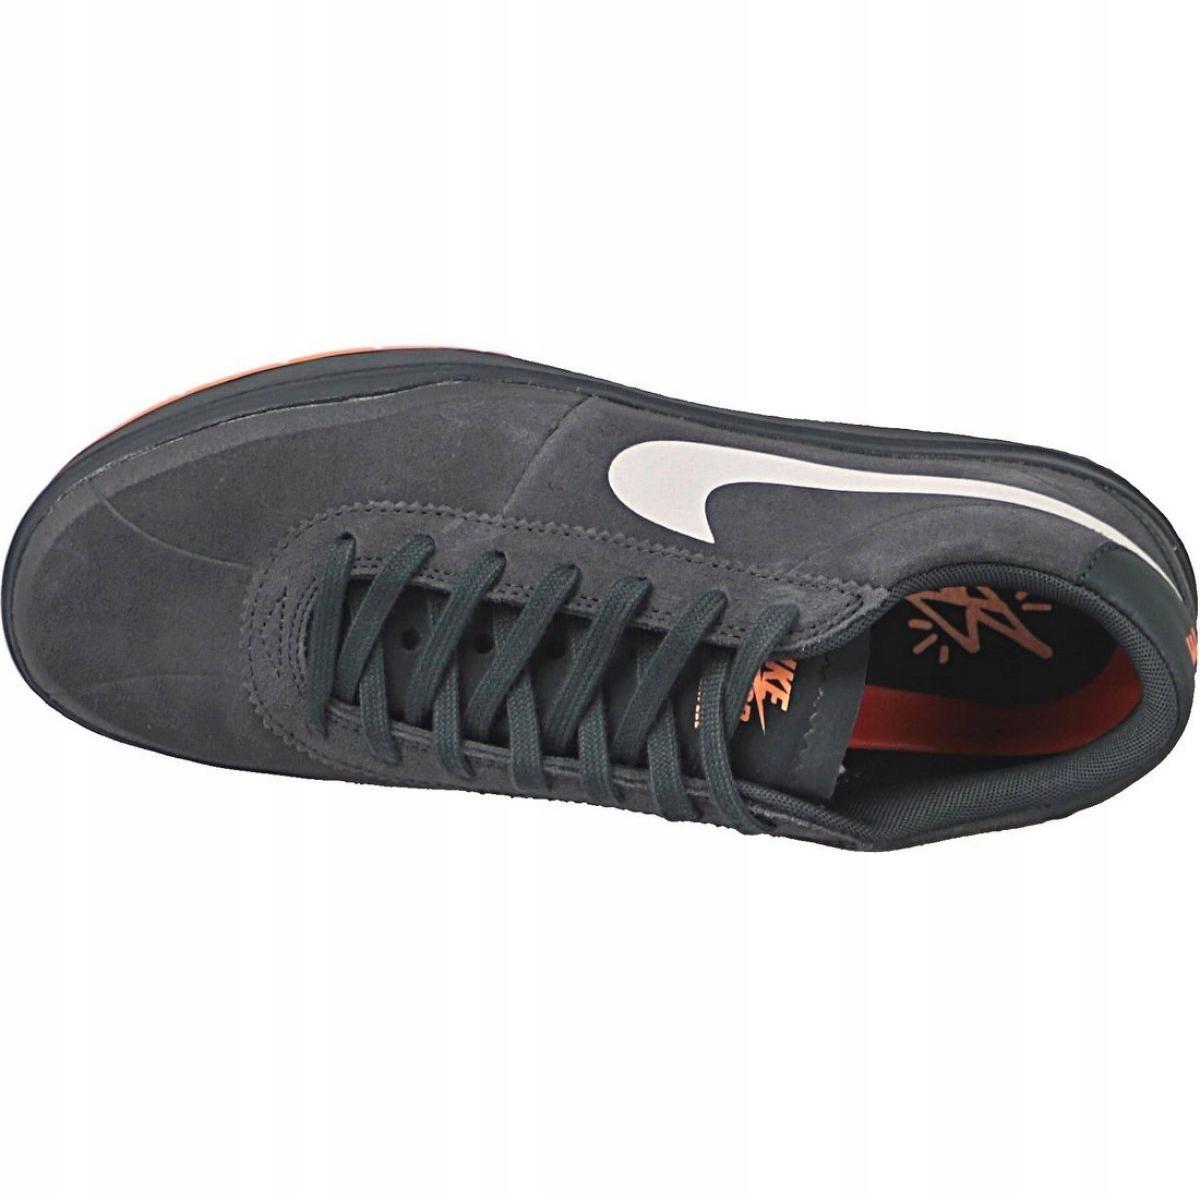 Nike Bruin Sb Hyperfeel Xt M 856372 018 cipő fekete